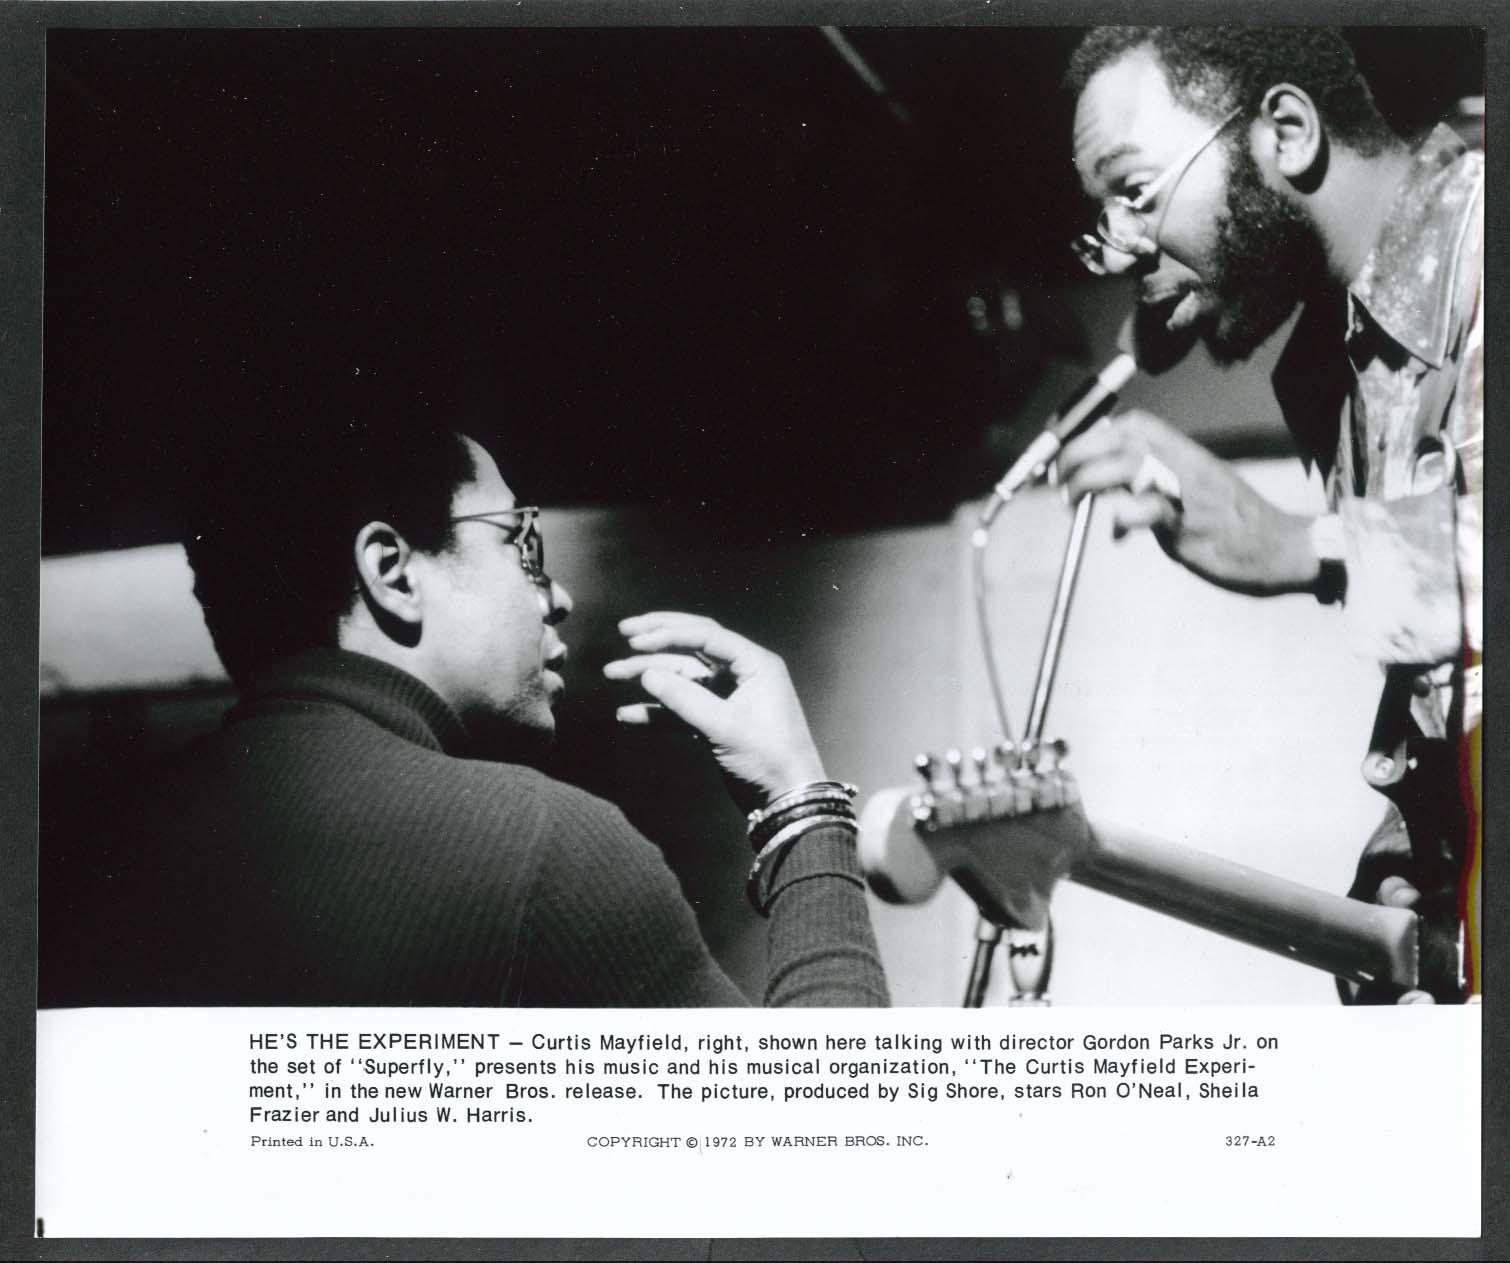 Gordon Parks & Curtis Mayfield